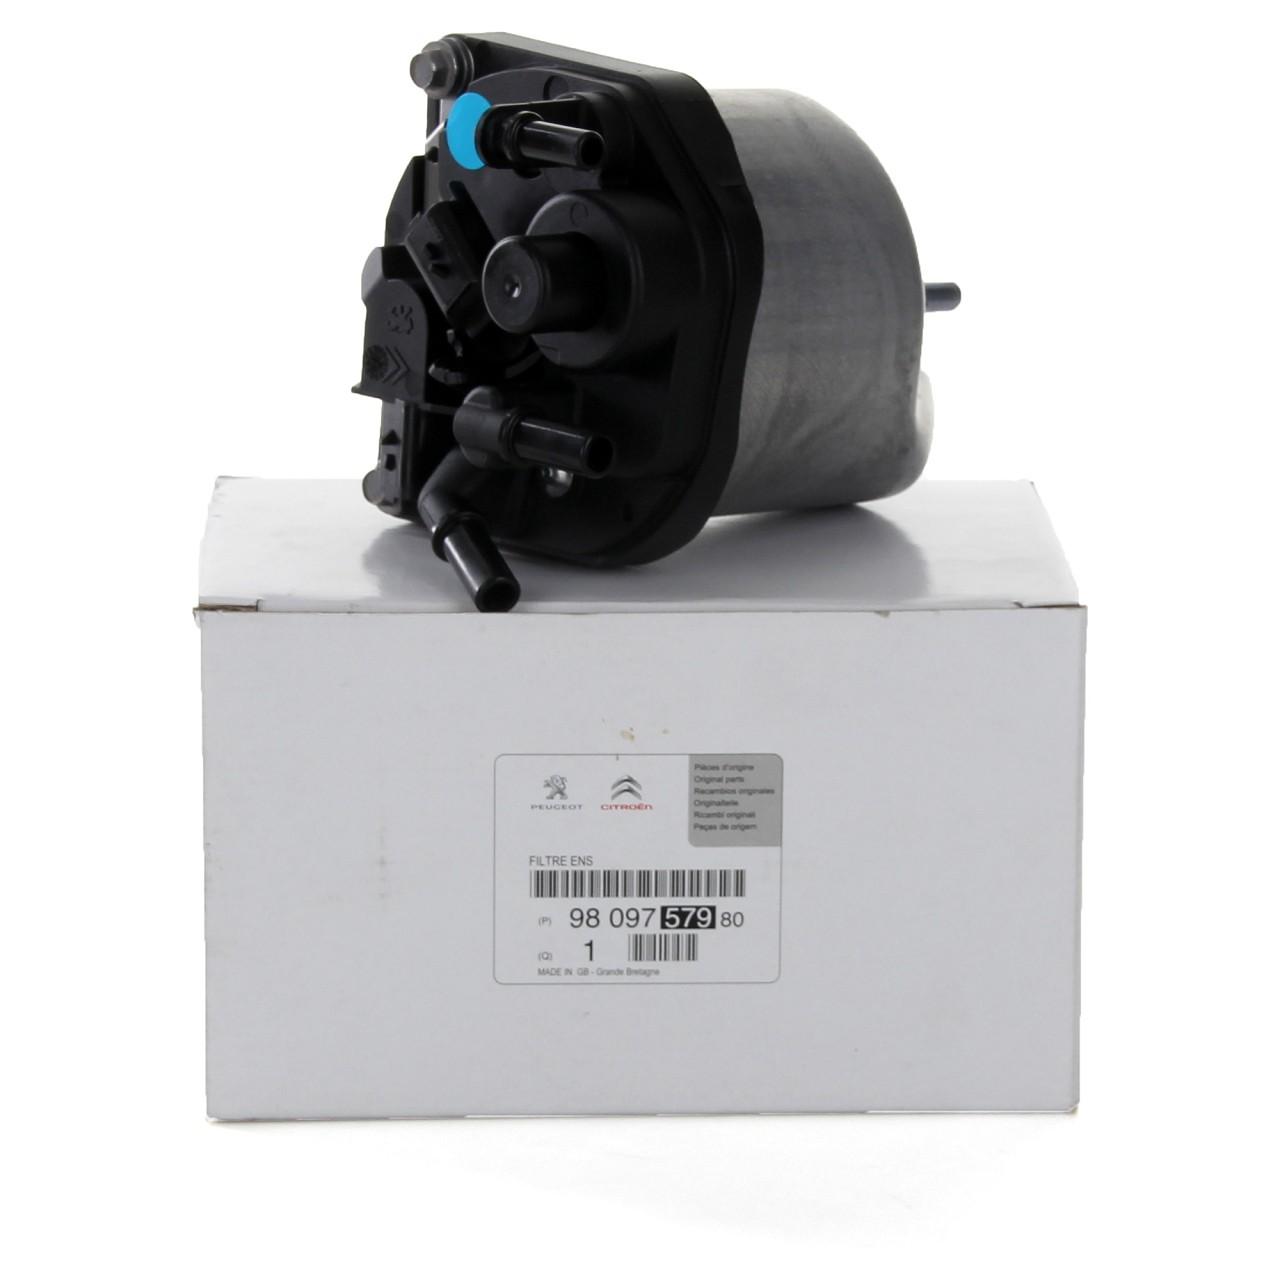 ORIGINAL Citroen Peugeot Kraftstofffilter Dieselfilter Boxer 2.2HDi 9809757980